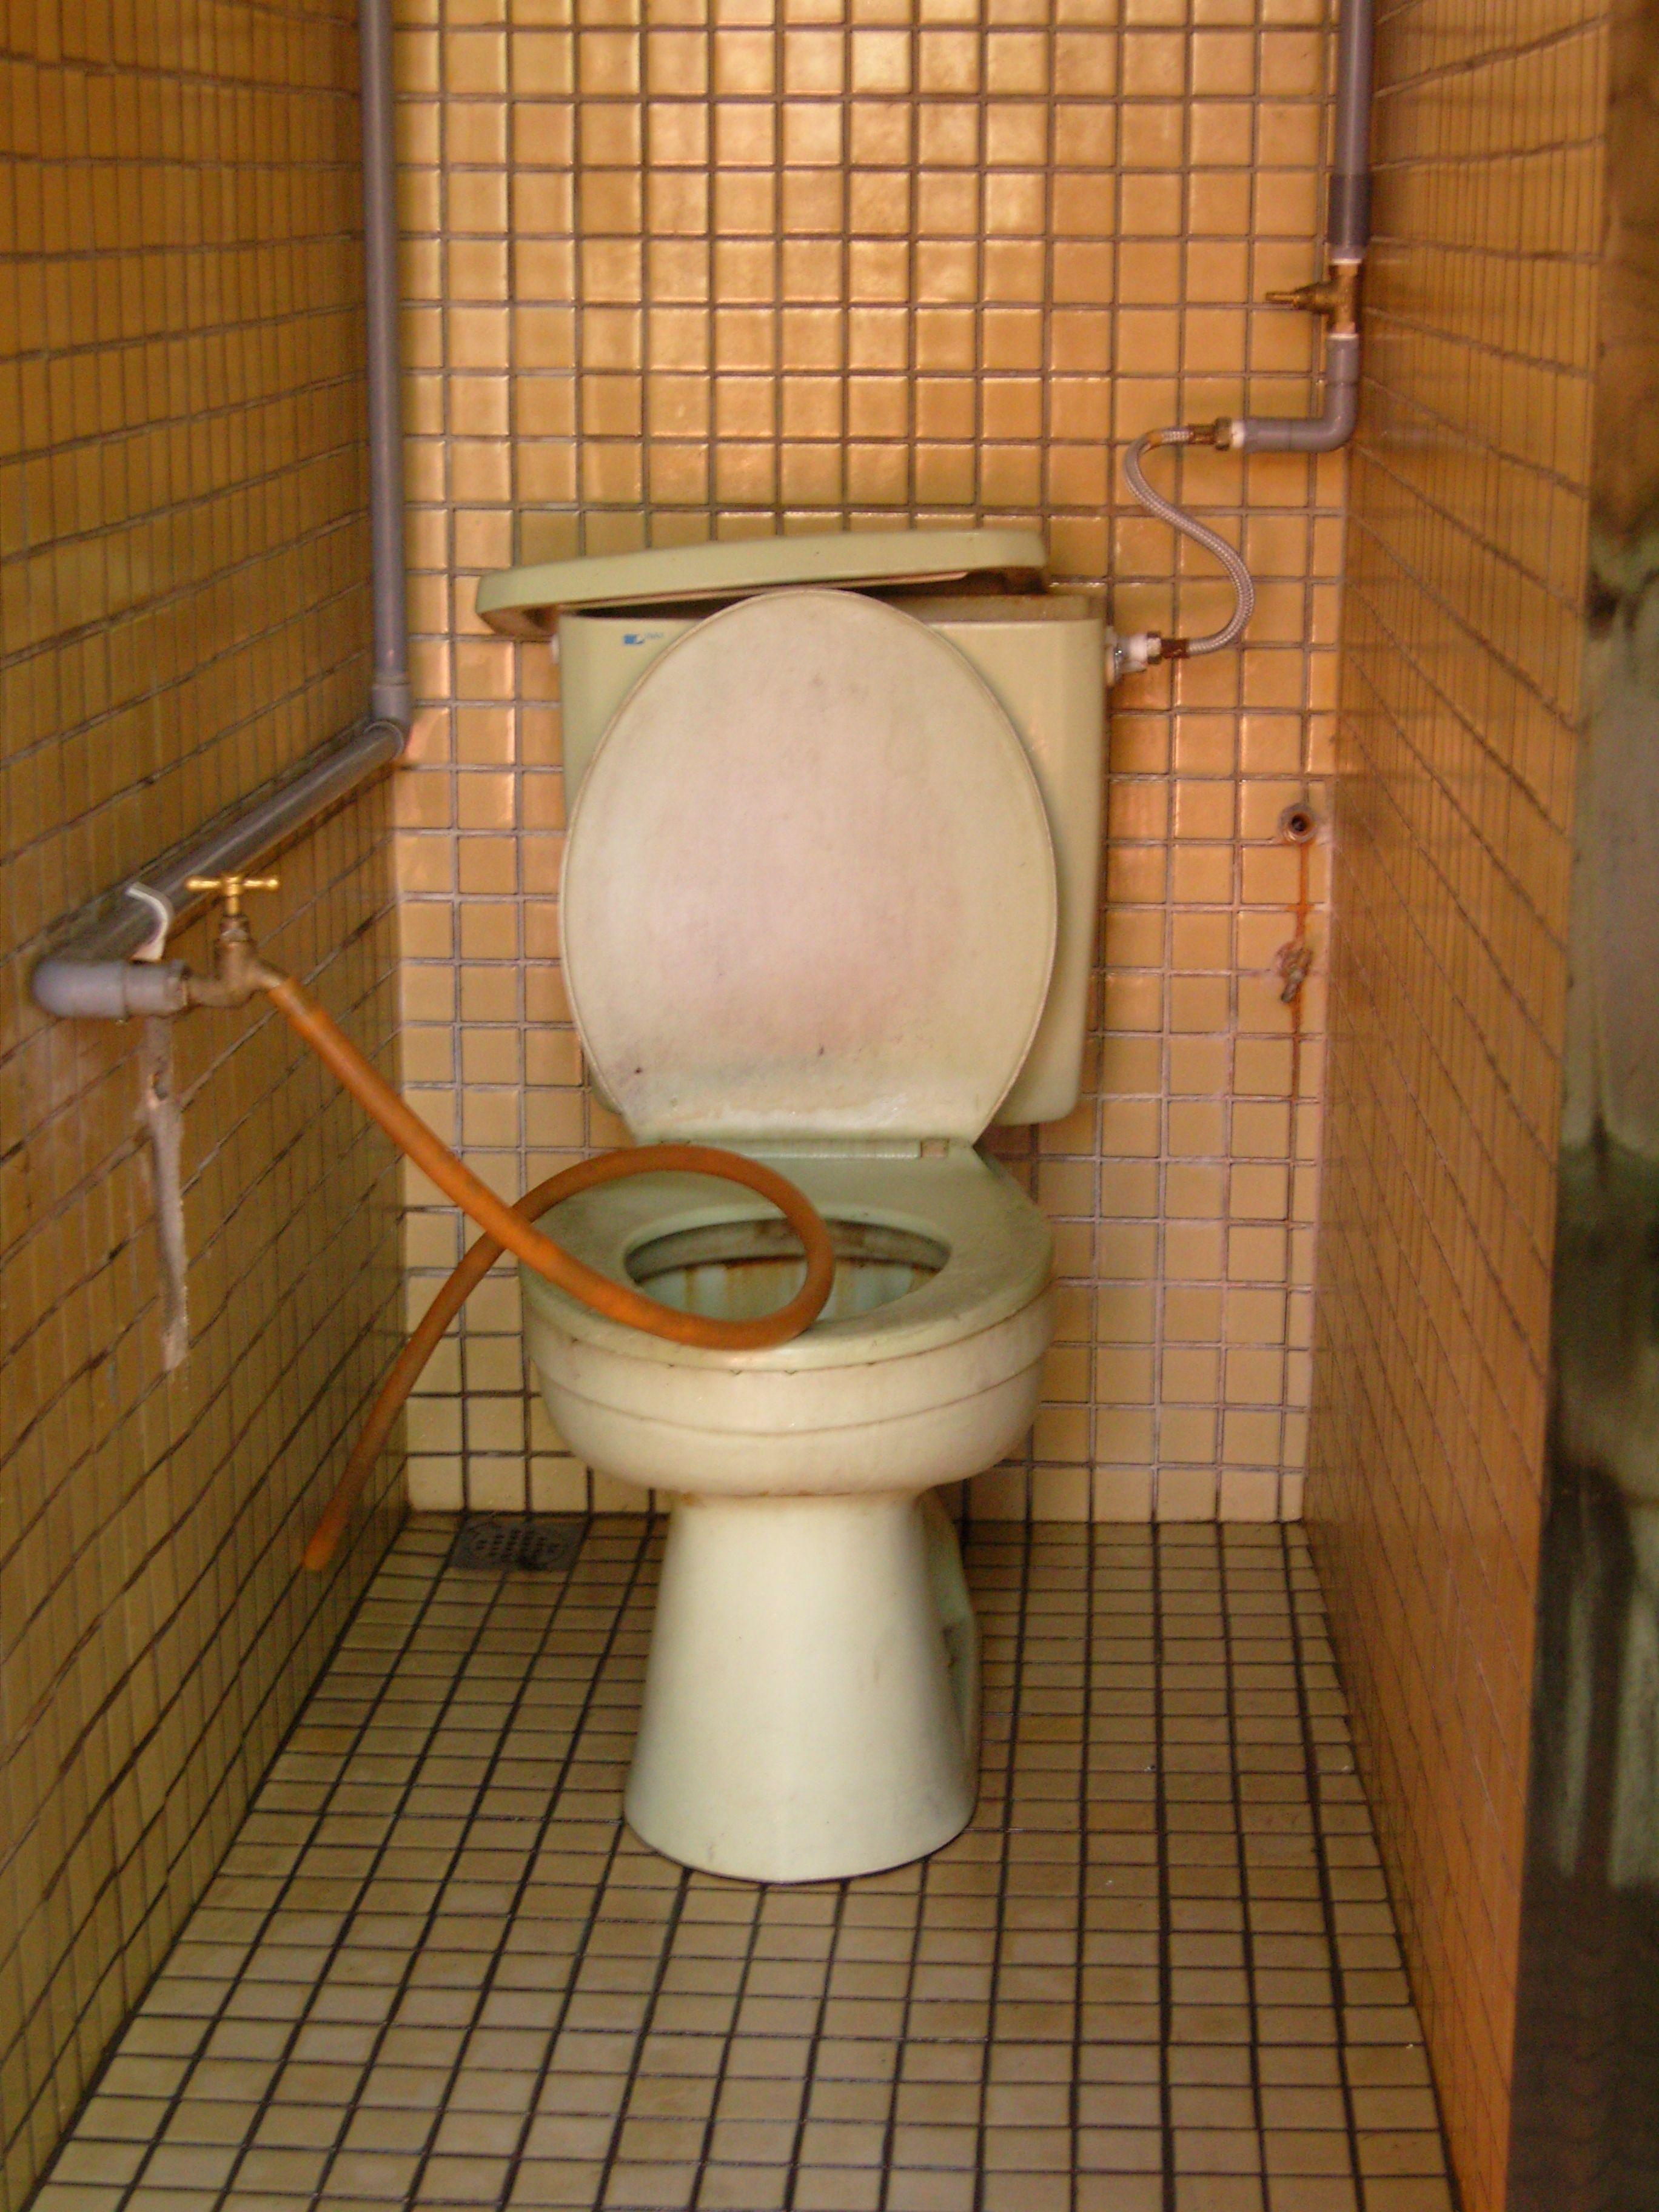 Malaysian toilet | Toilets of the World | Pinterest | Toilet